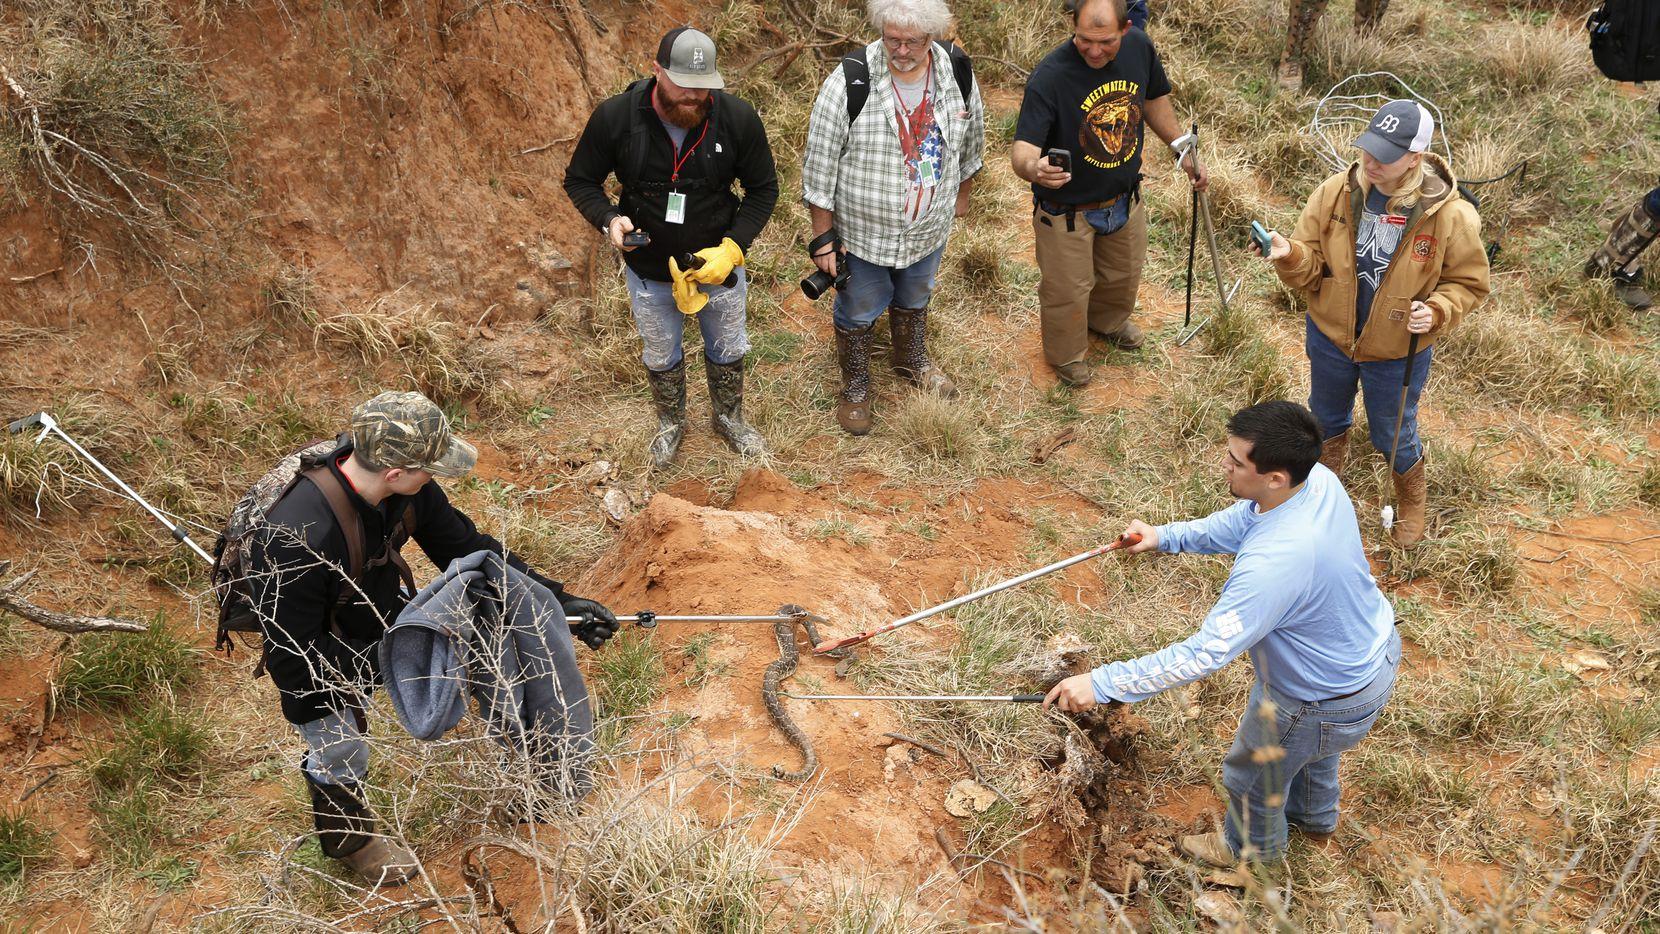 Cancel Next Year's Rattlesnake Roundup